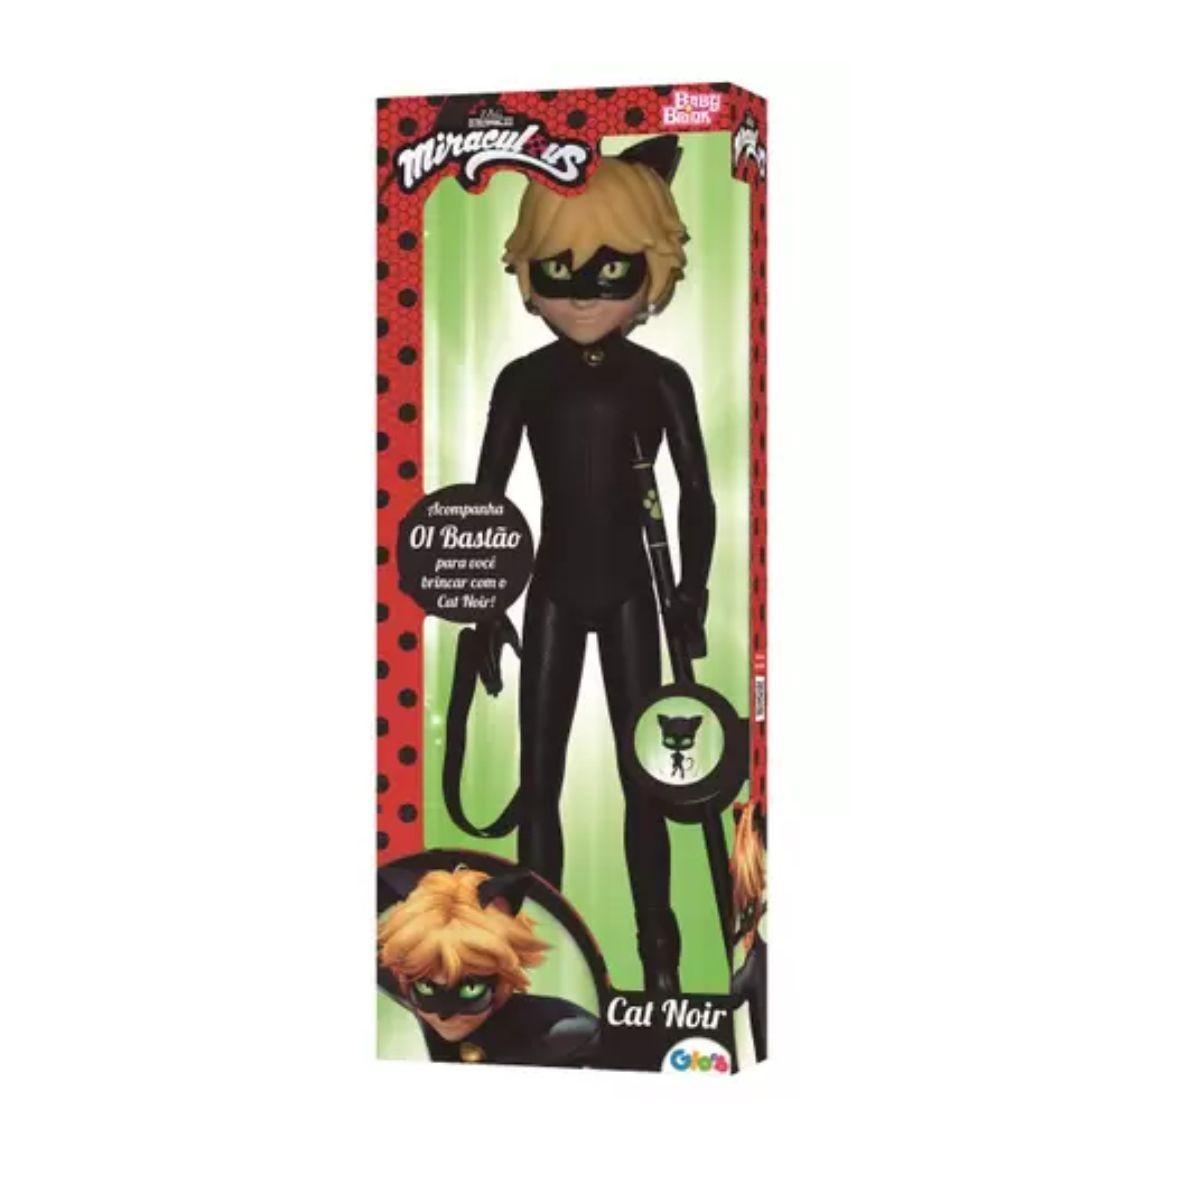 Boneco Miraculous Cat Noir 55 cm - Baby Brink